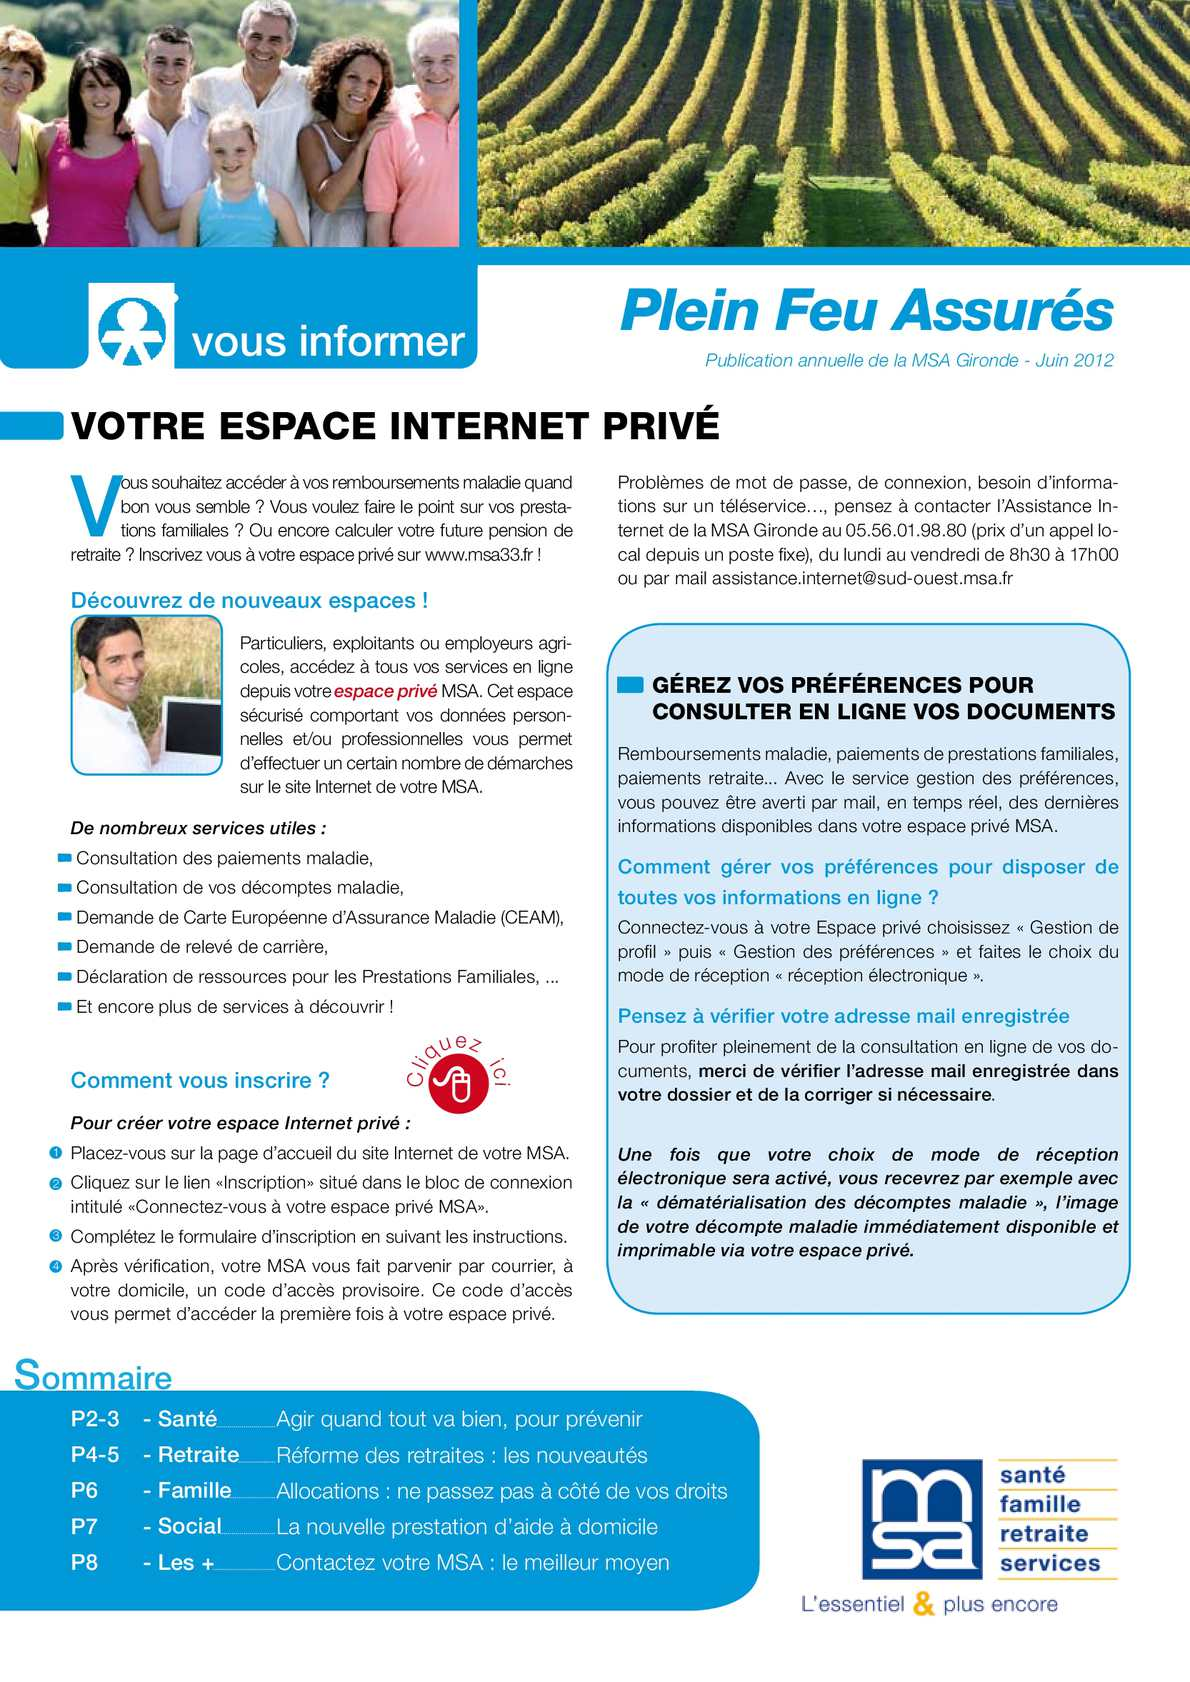 Carte Assurance Maladie Msa.Calameo Plein Feu Assures 2012